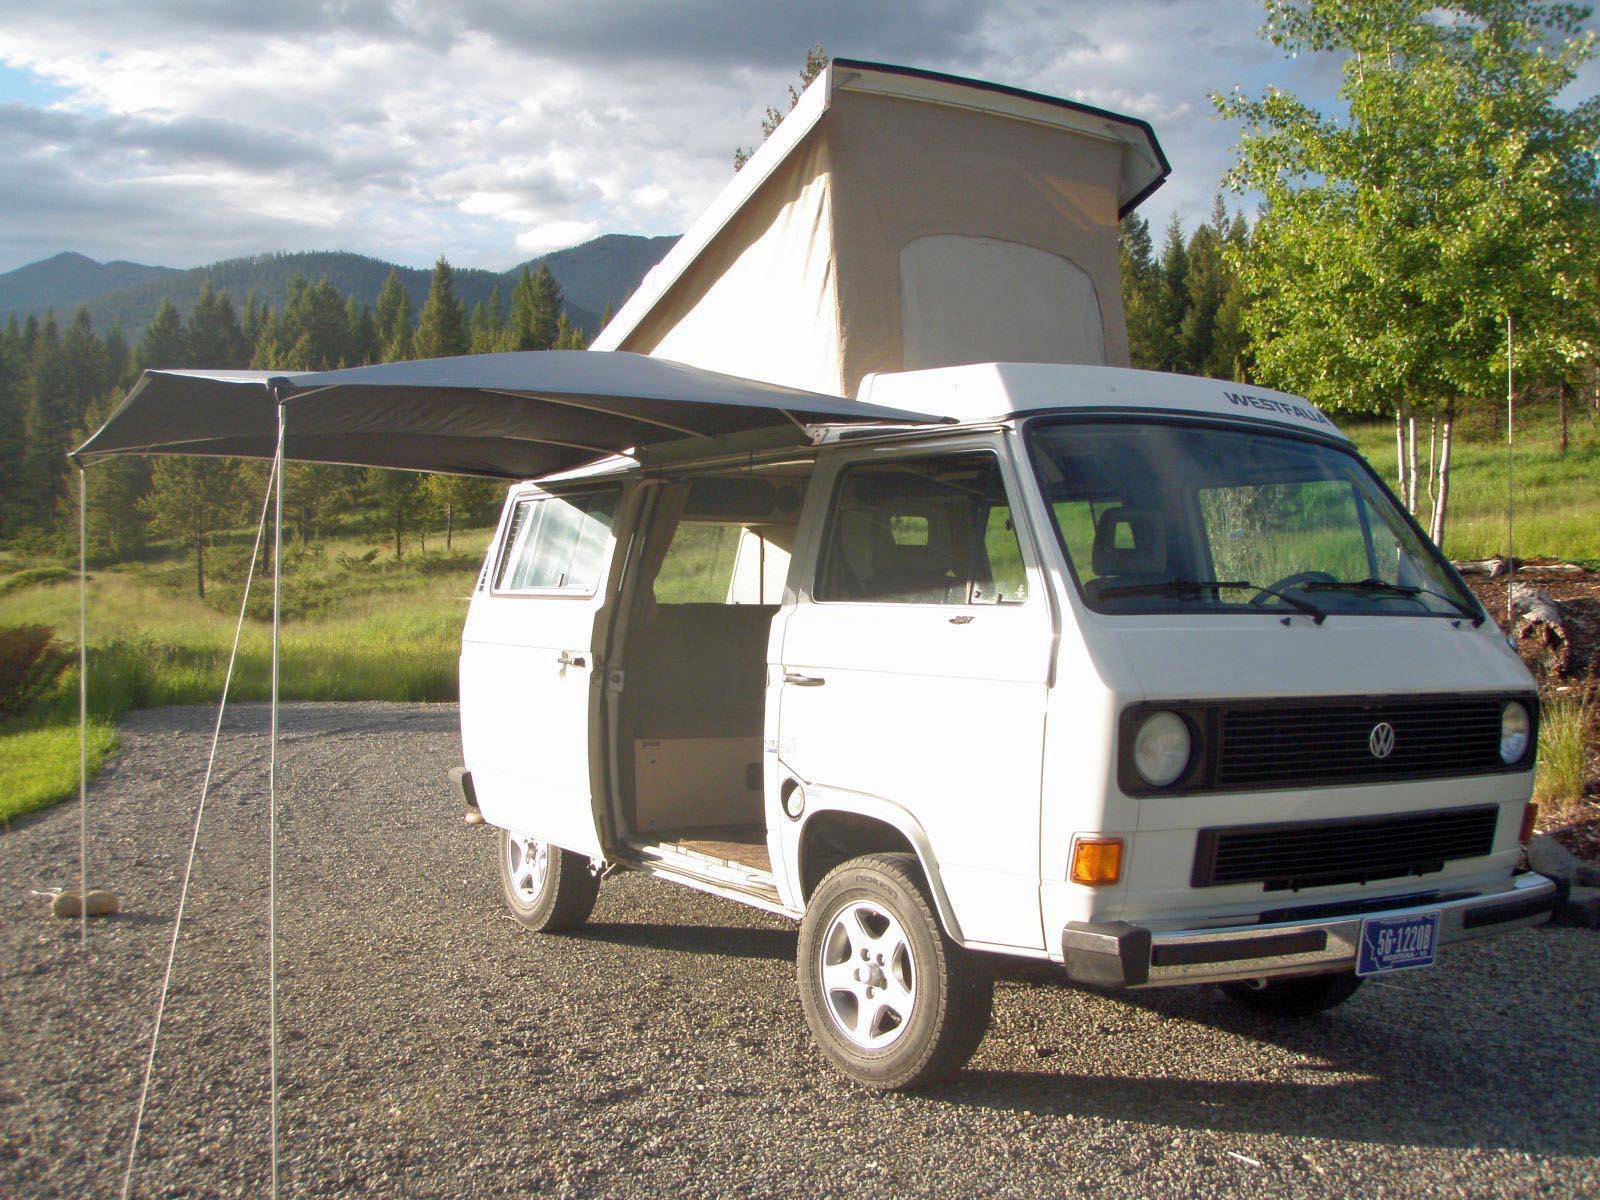 1985 VW Vanagon Westfalia Camper Auction in Eureka, Montana ends